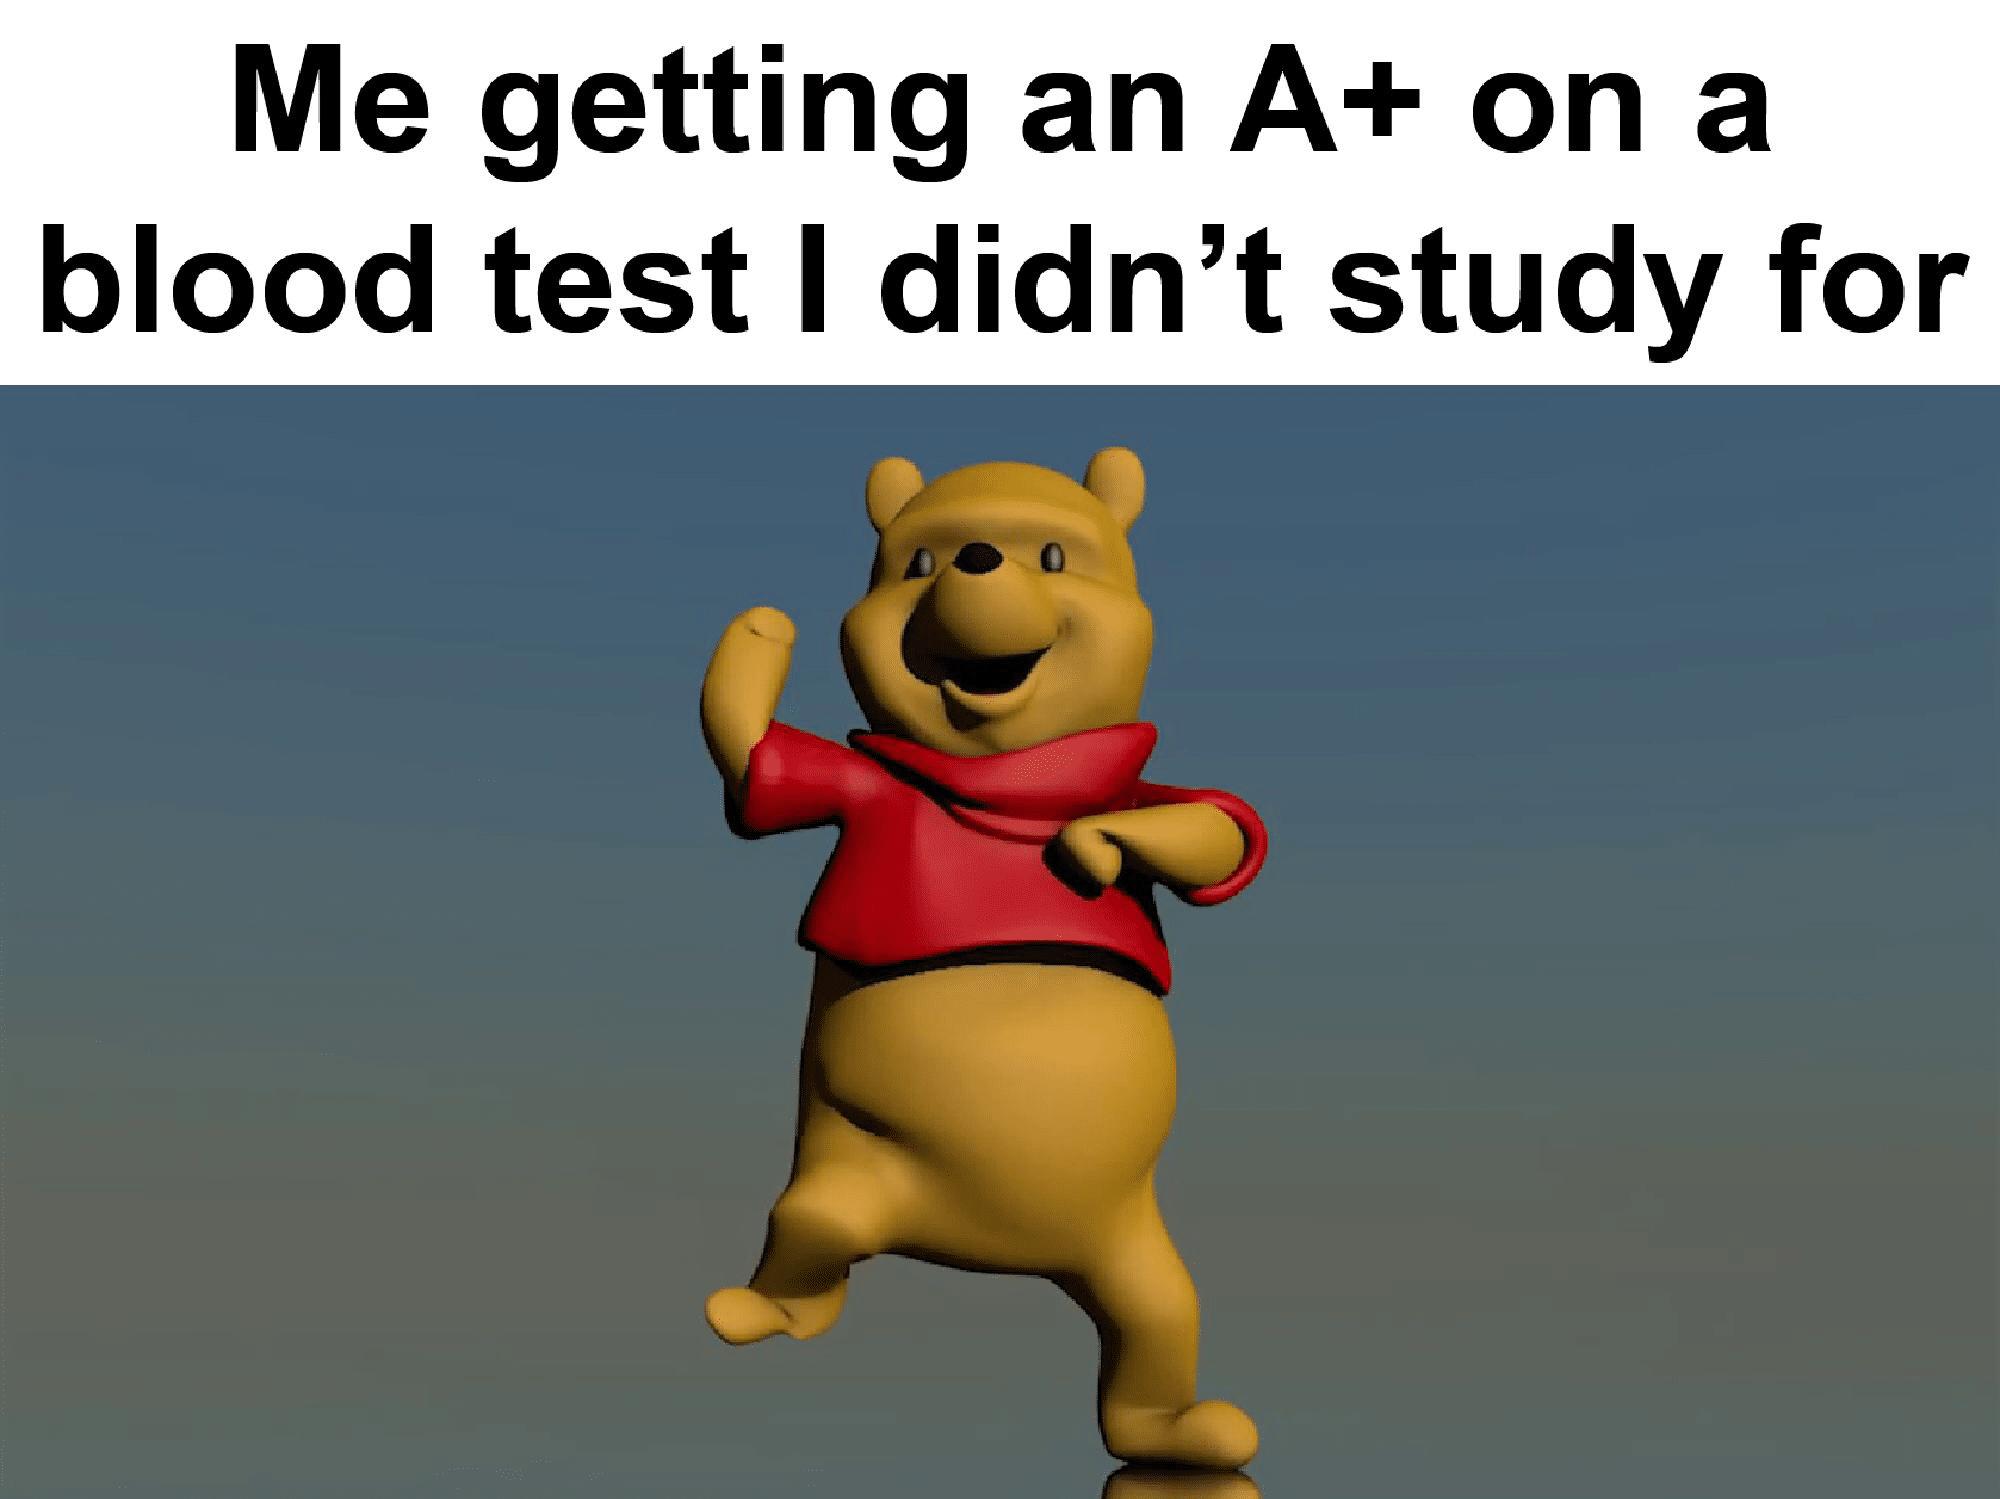 Dank Meme, Surreal Meme, Winnie the Pooh, Grade, School dank-memes cute text: Me getting an A+ on a blood test I didn't study for